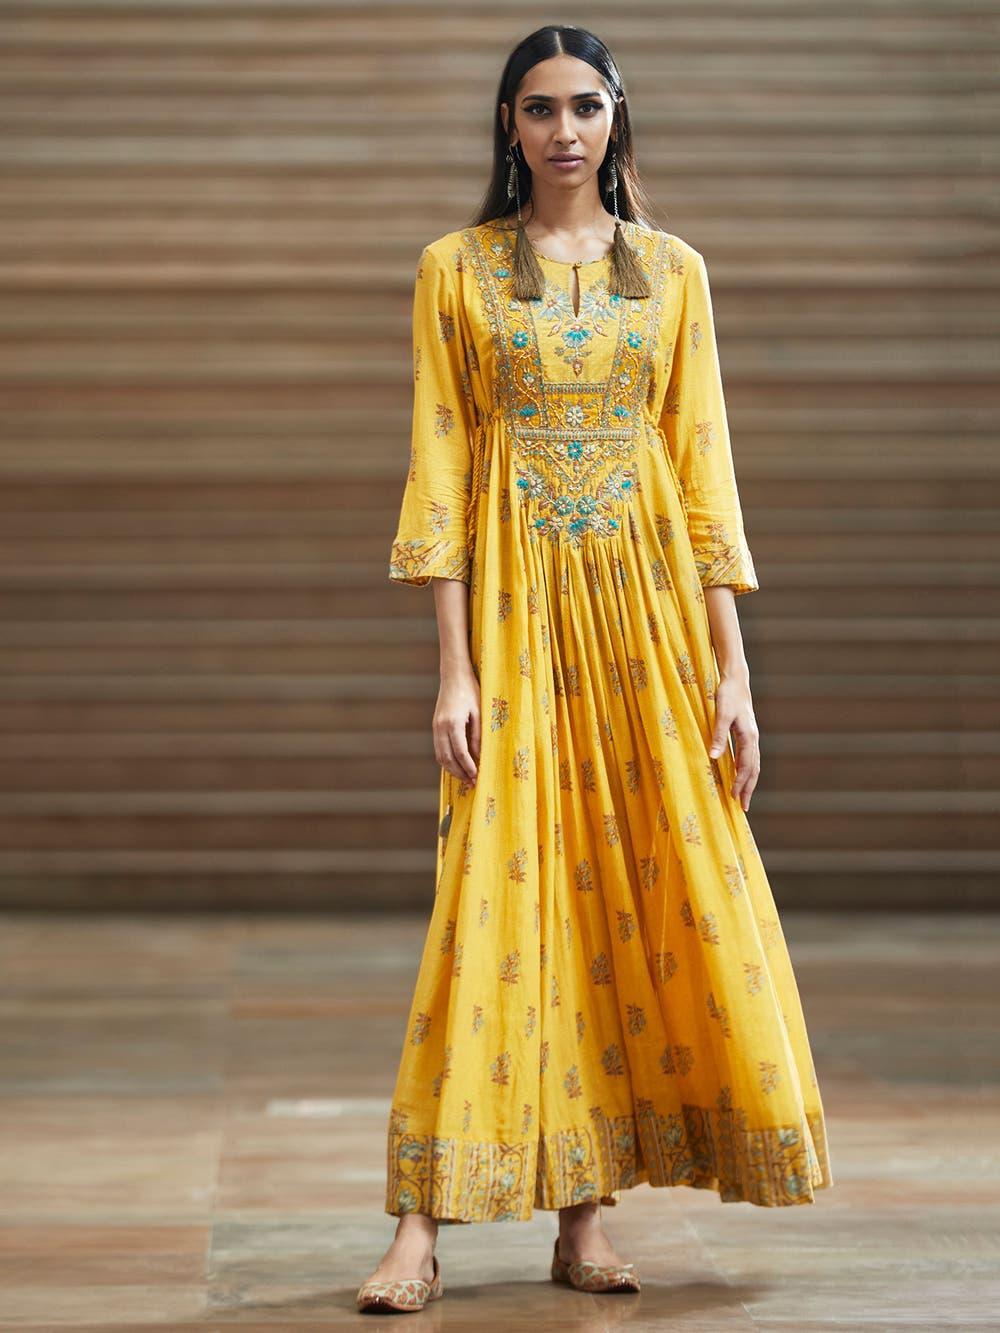 yellow Anarkali outfits